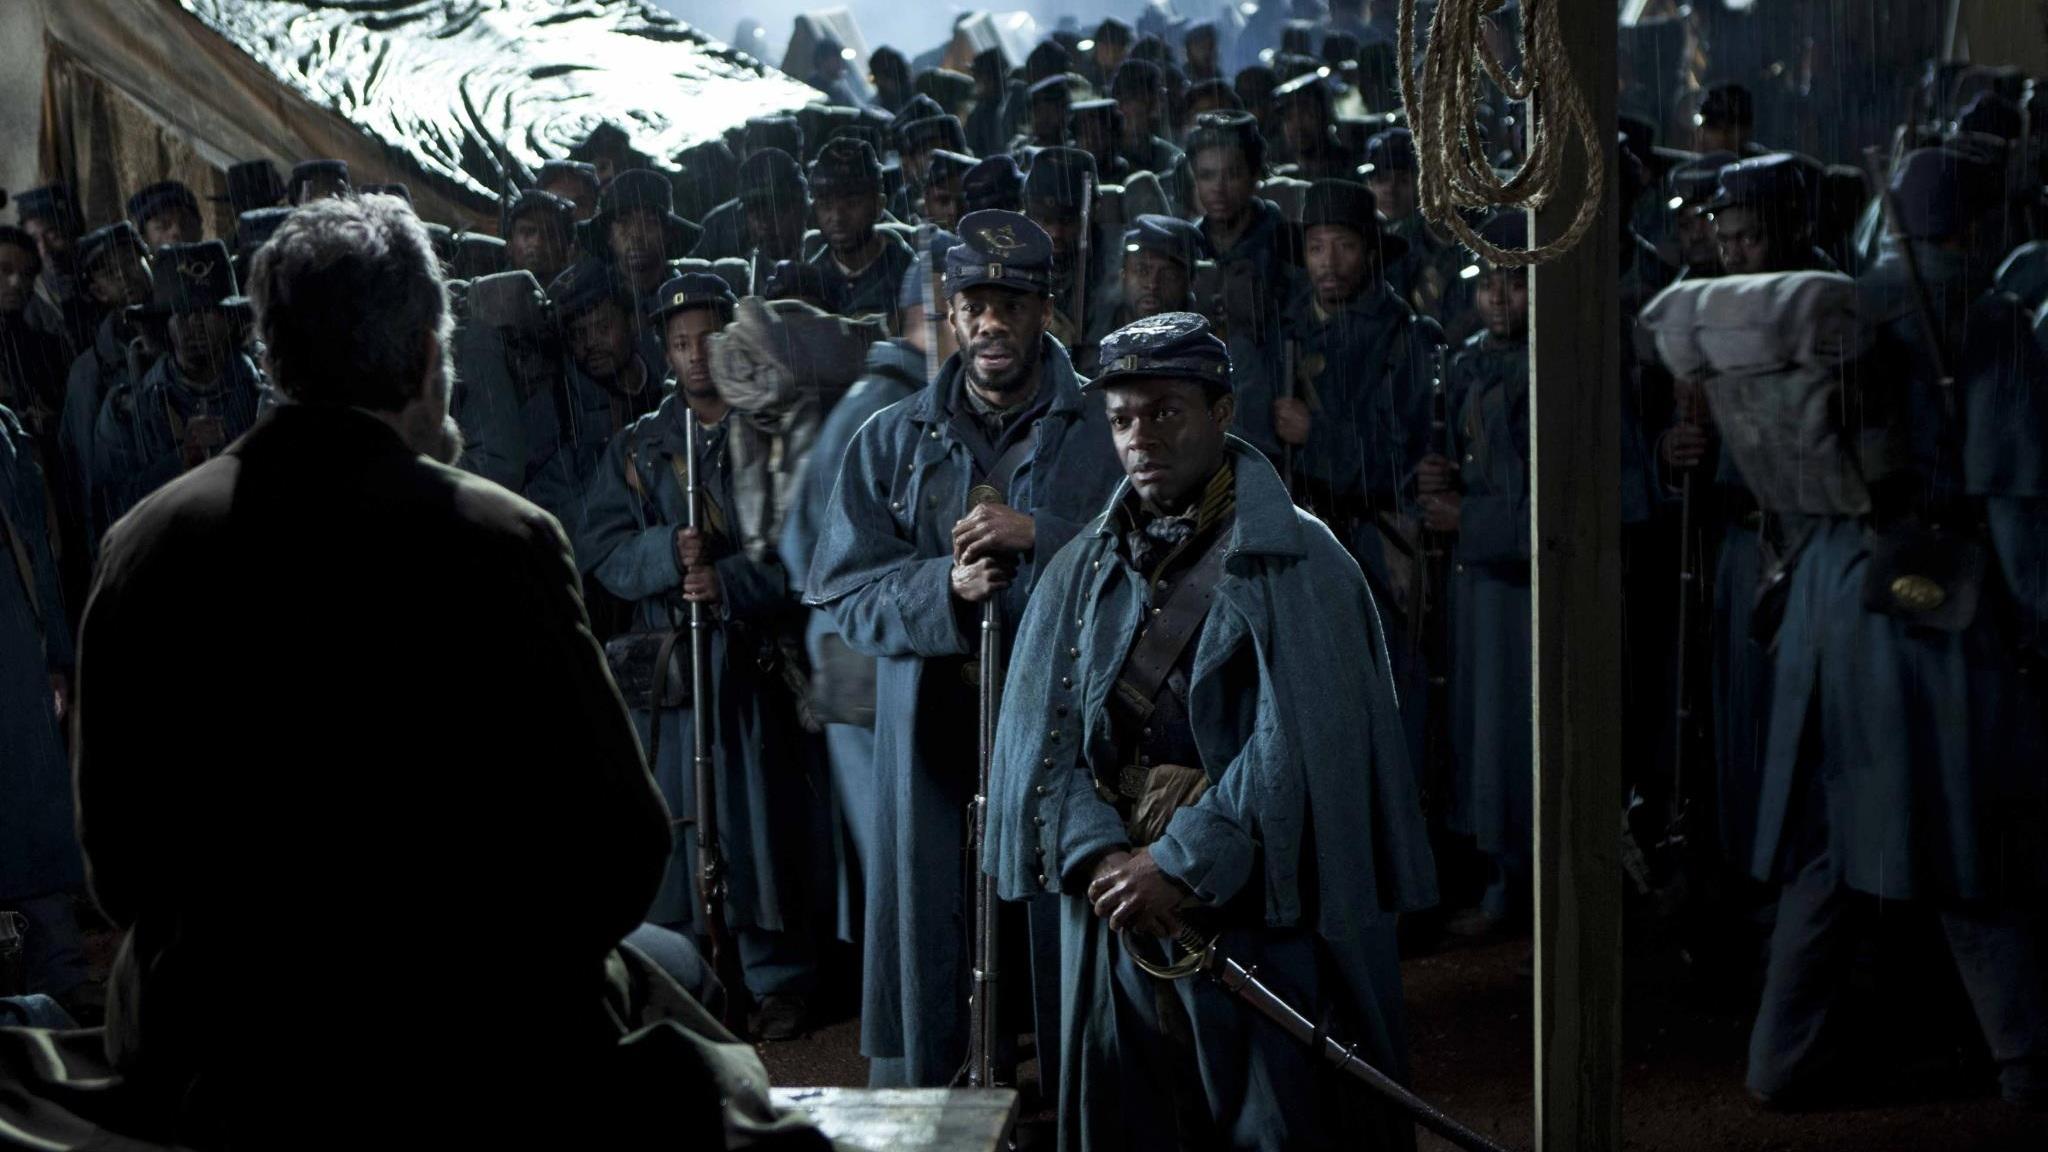 #4) Lincoln - (2012 - dir. Steven Spielberg)